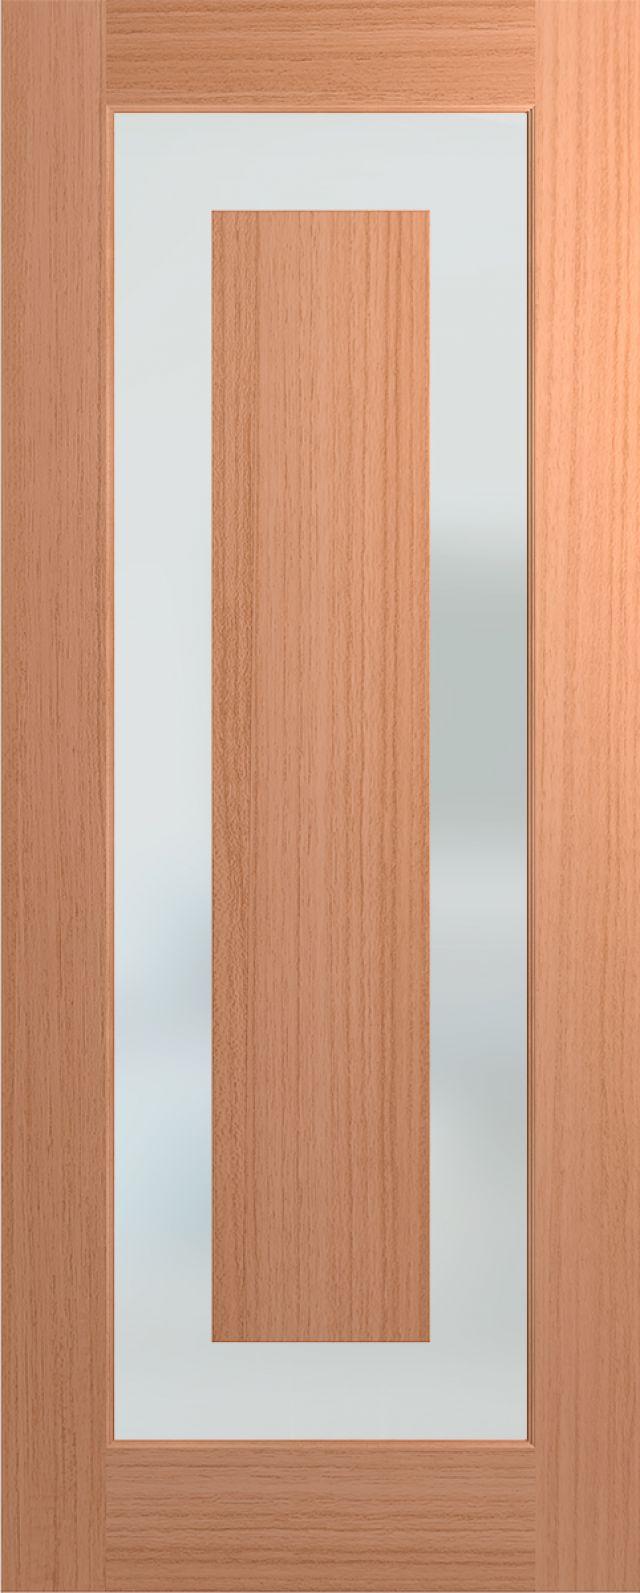 XIL1. Illusion. Customise your door & XIL1 | Illusion | Hume Doors